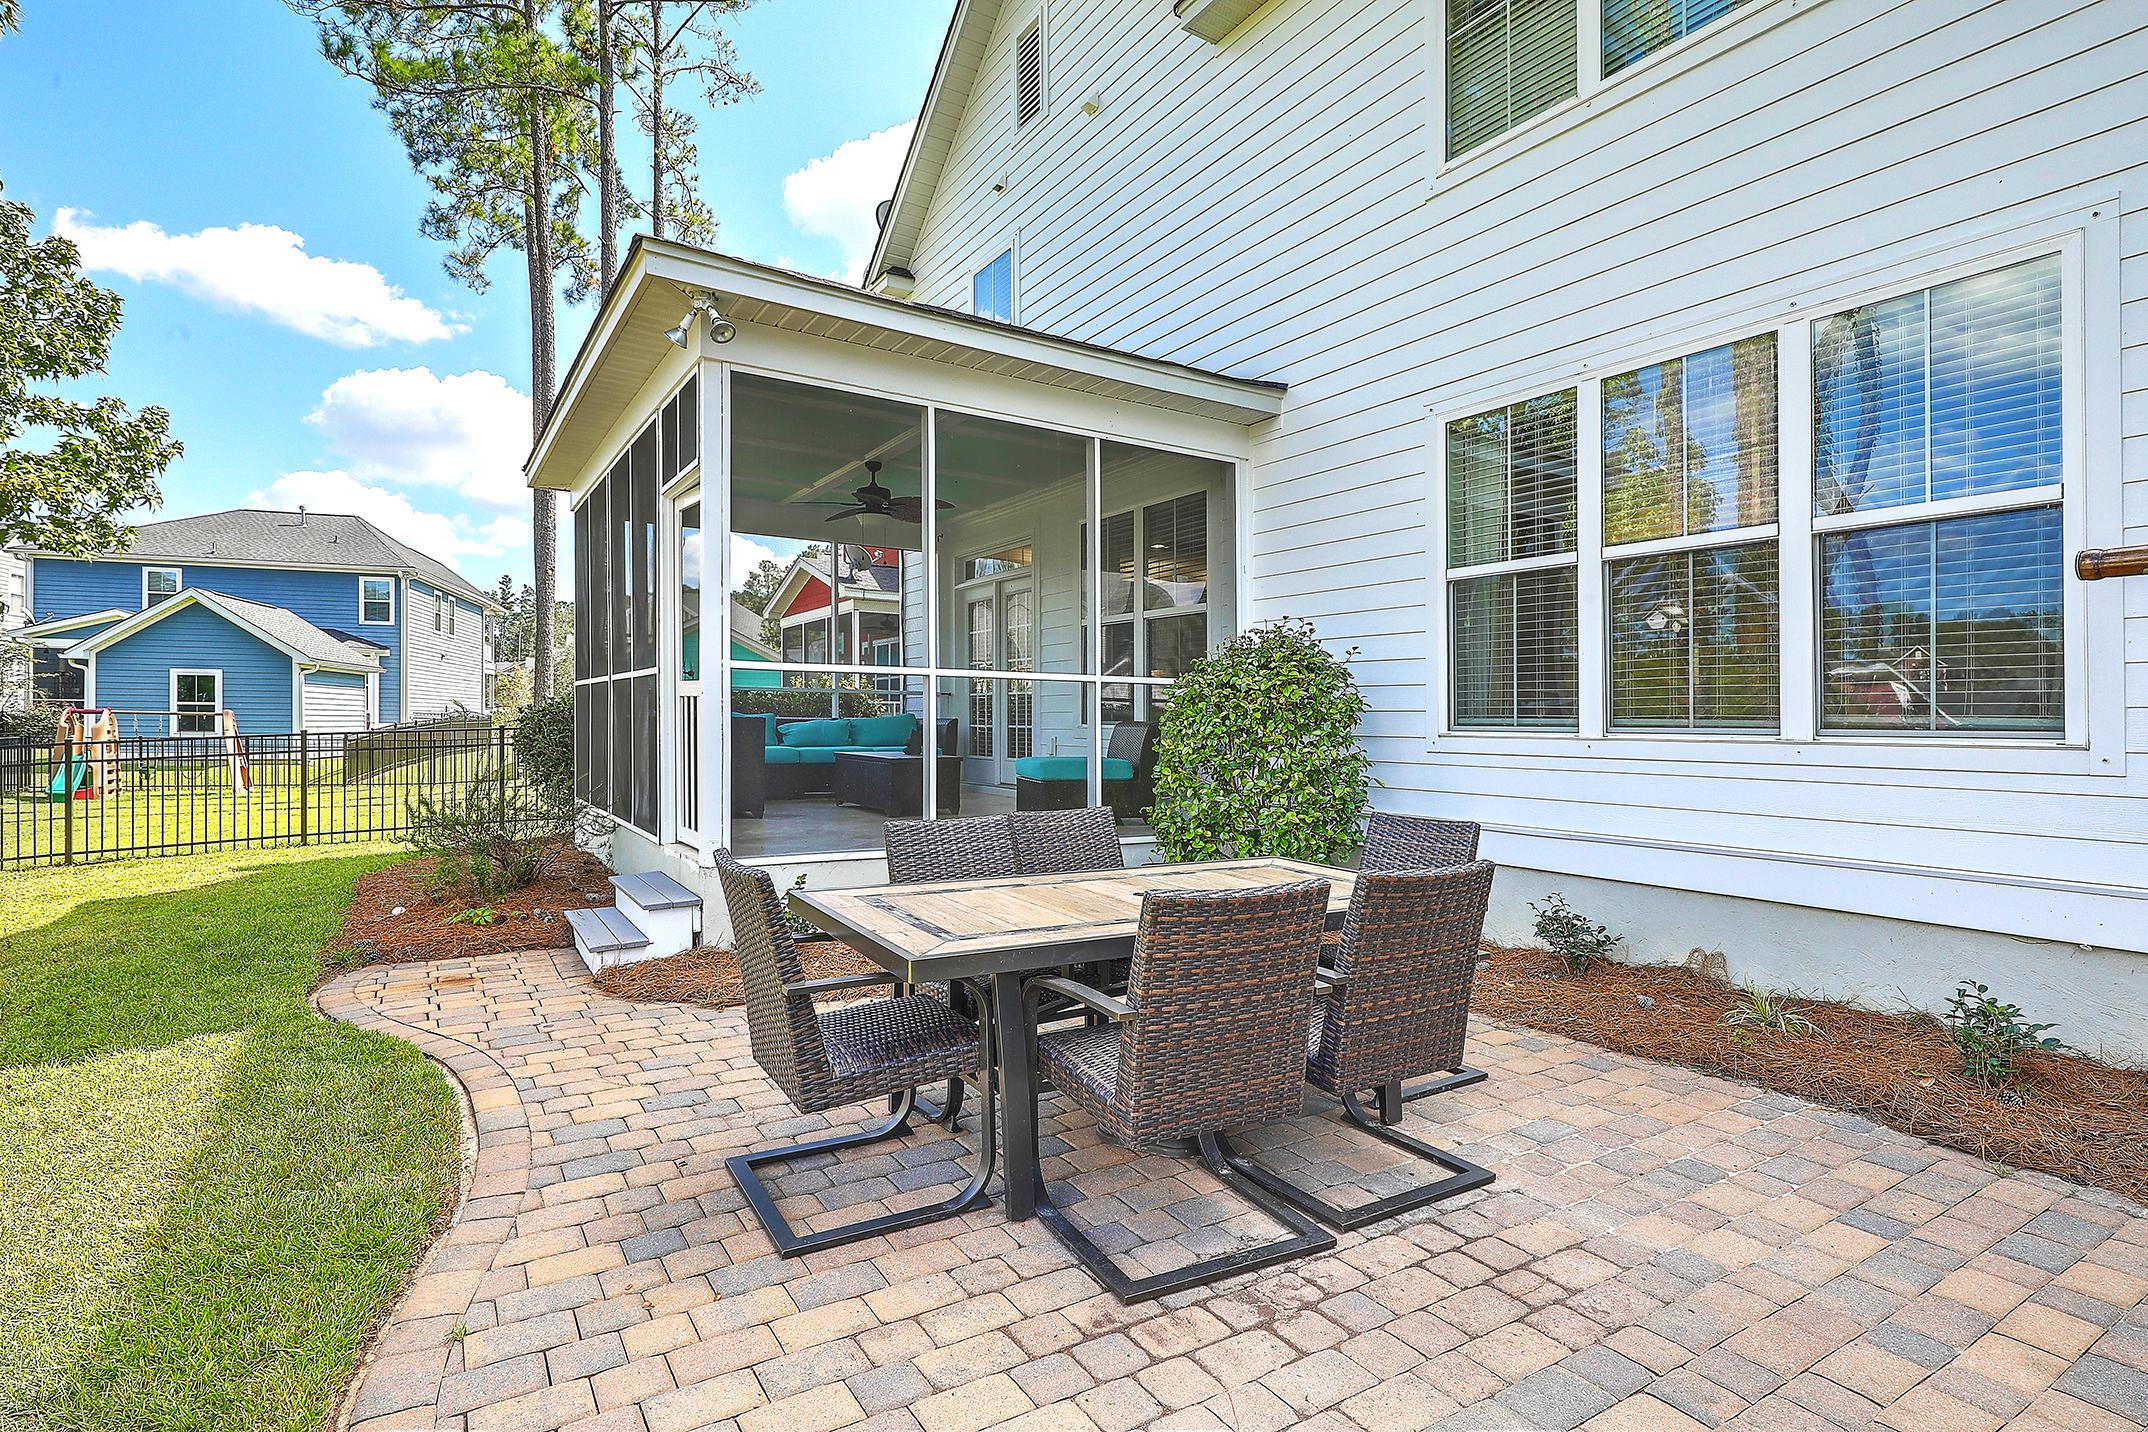 Branch Creek Homes For Sale - 304 Pond Hill, Summerville, SC - 5